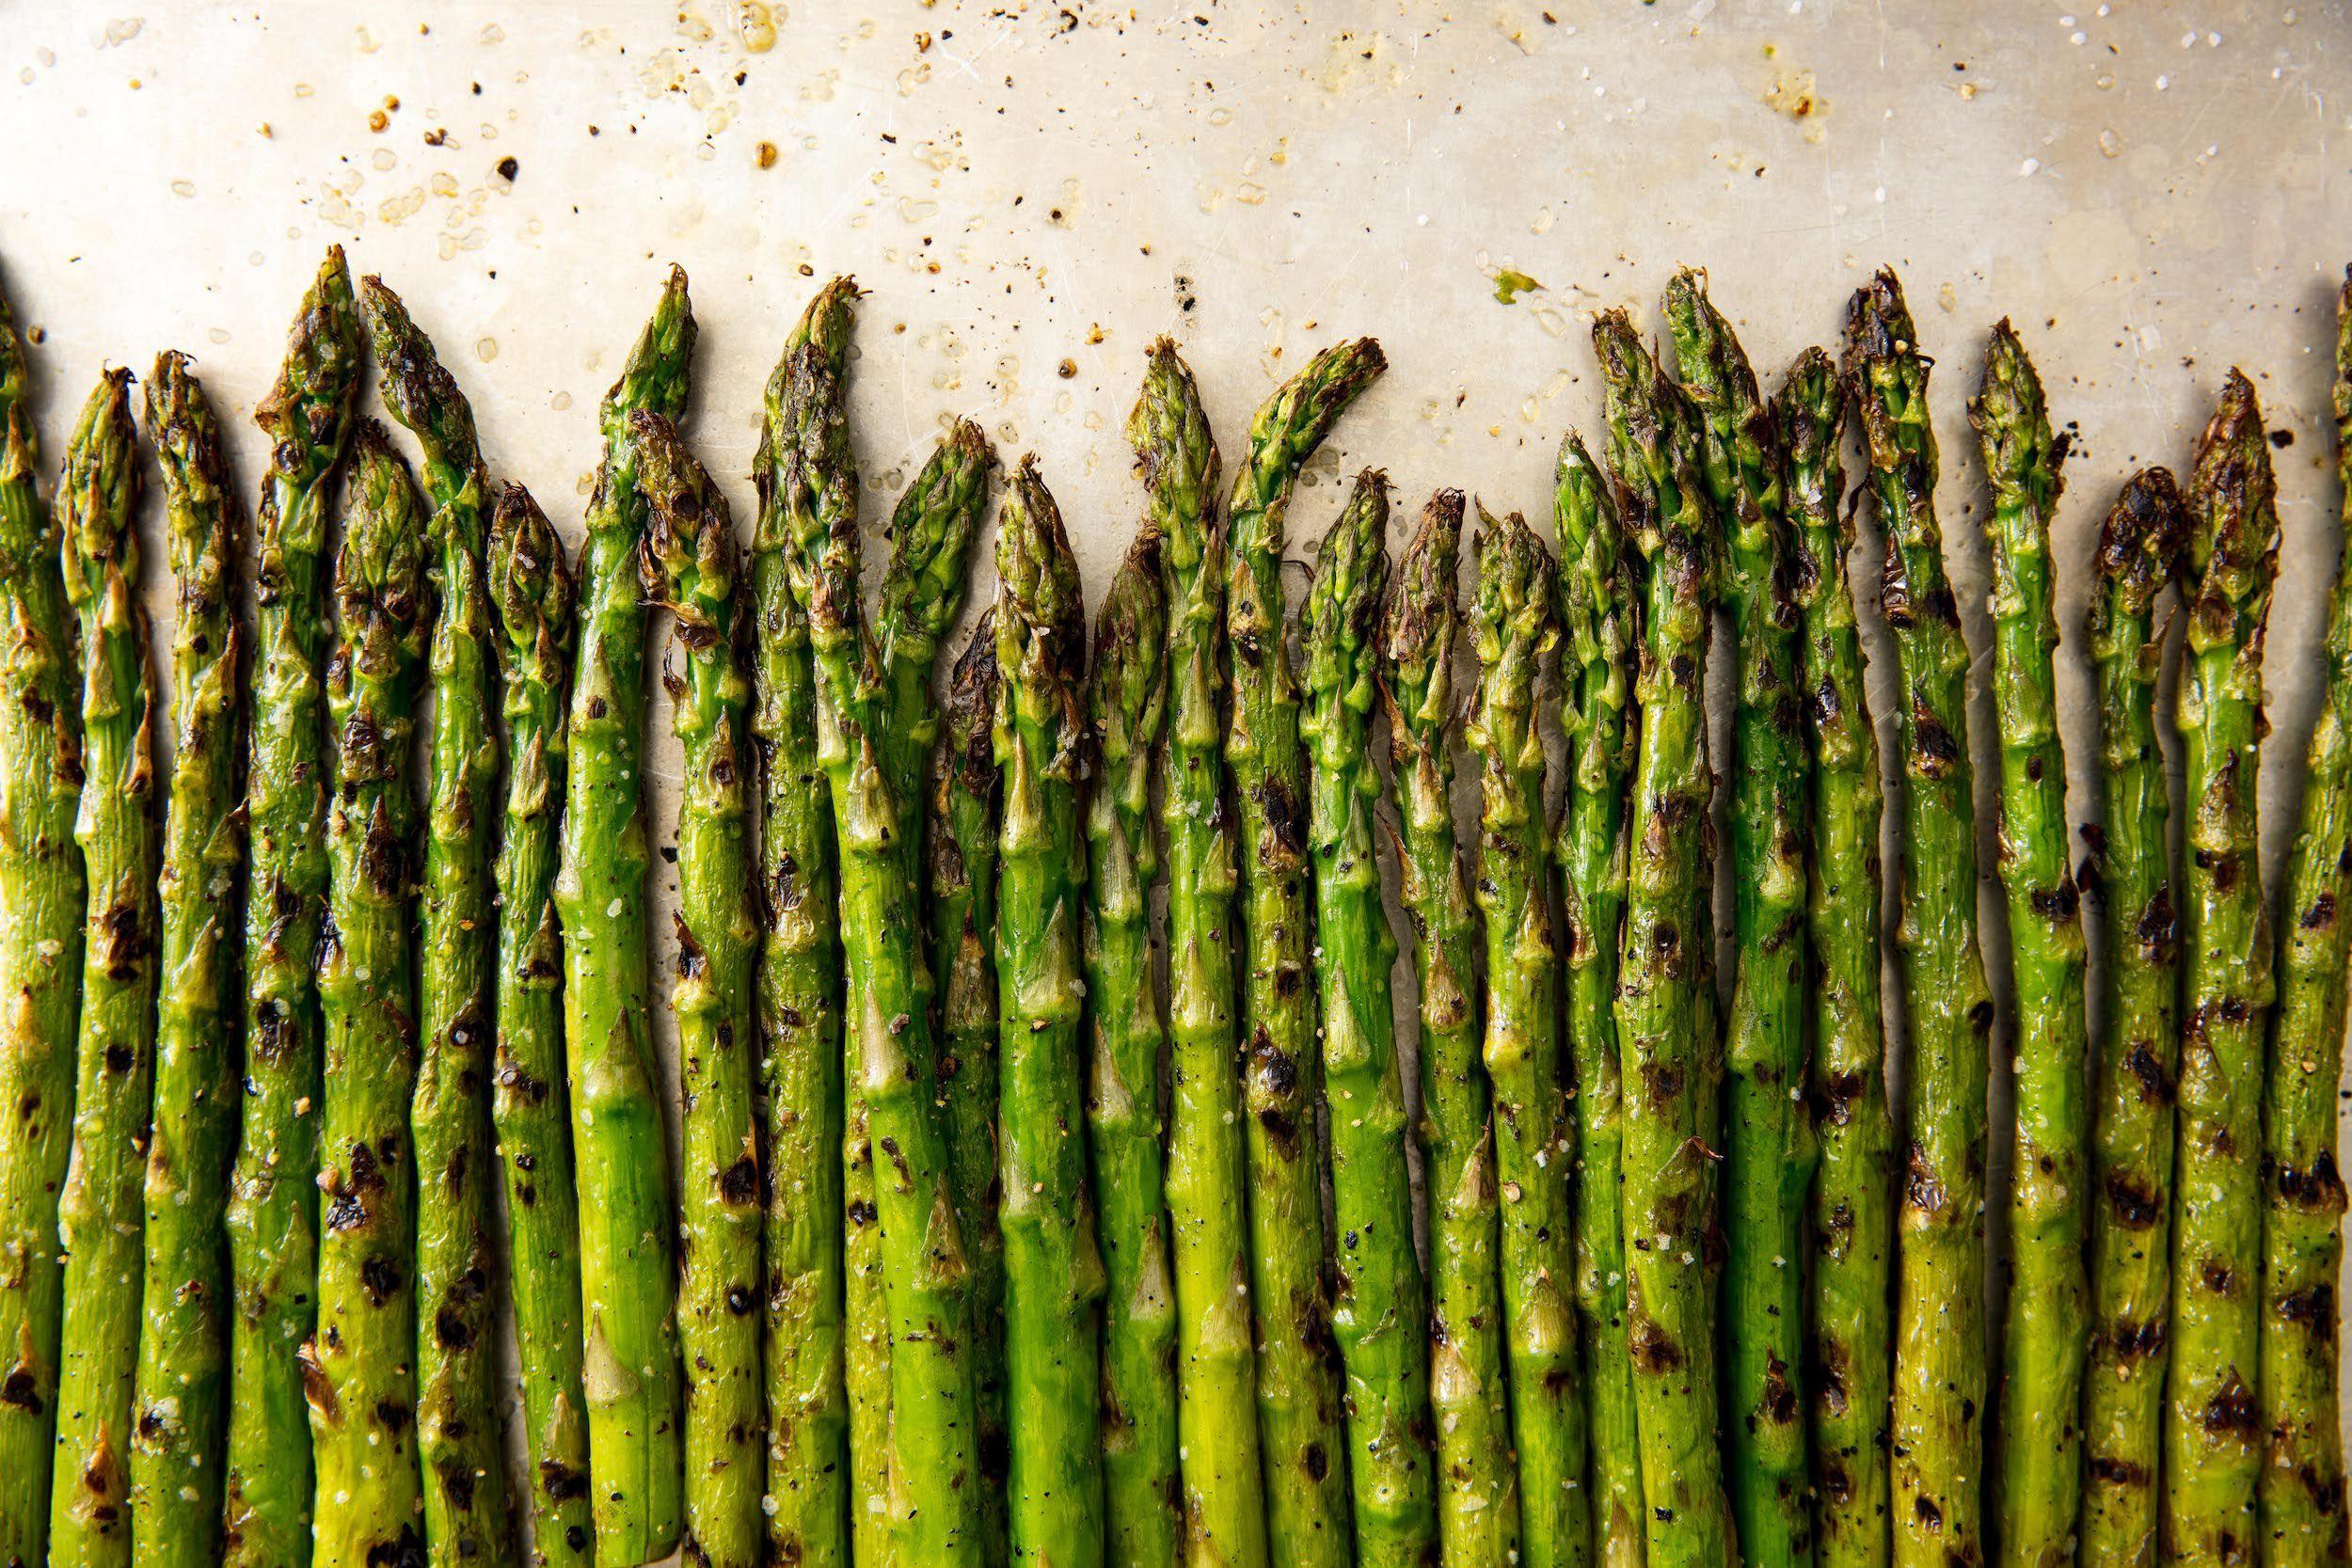 How to Cook Asparagus - Easy Recipes to Grill, Roast & Sauté Asparagus